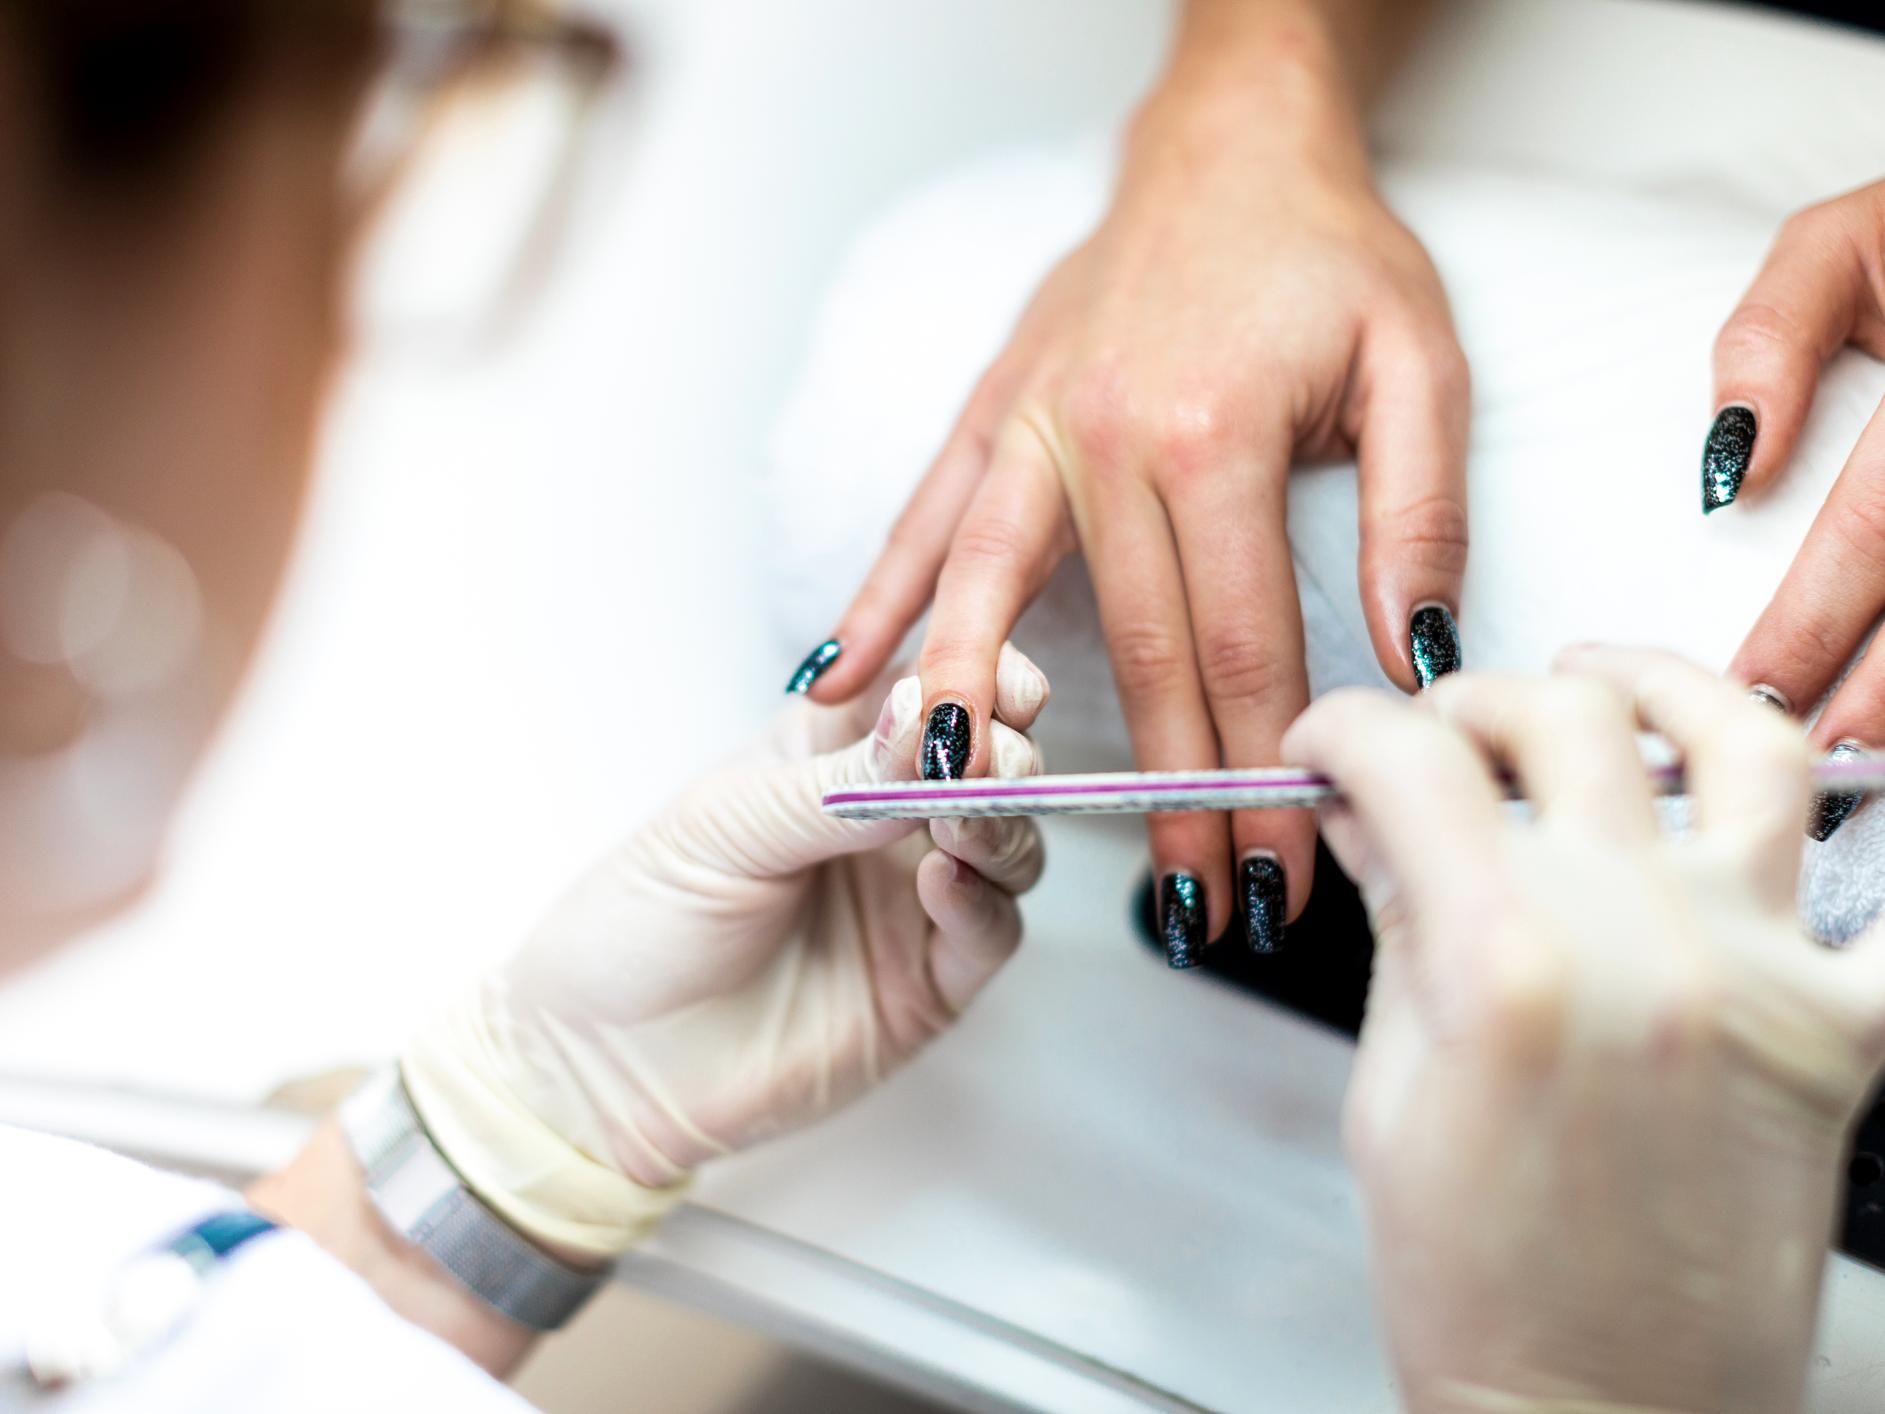 Nail Salon Worker Tests Positive For Coronavirus